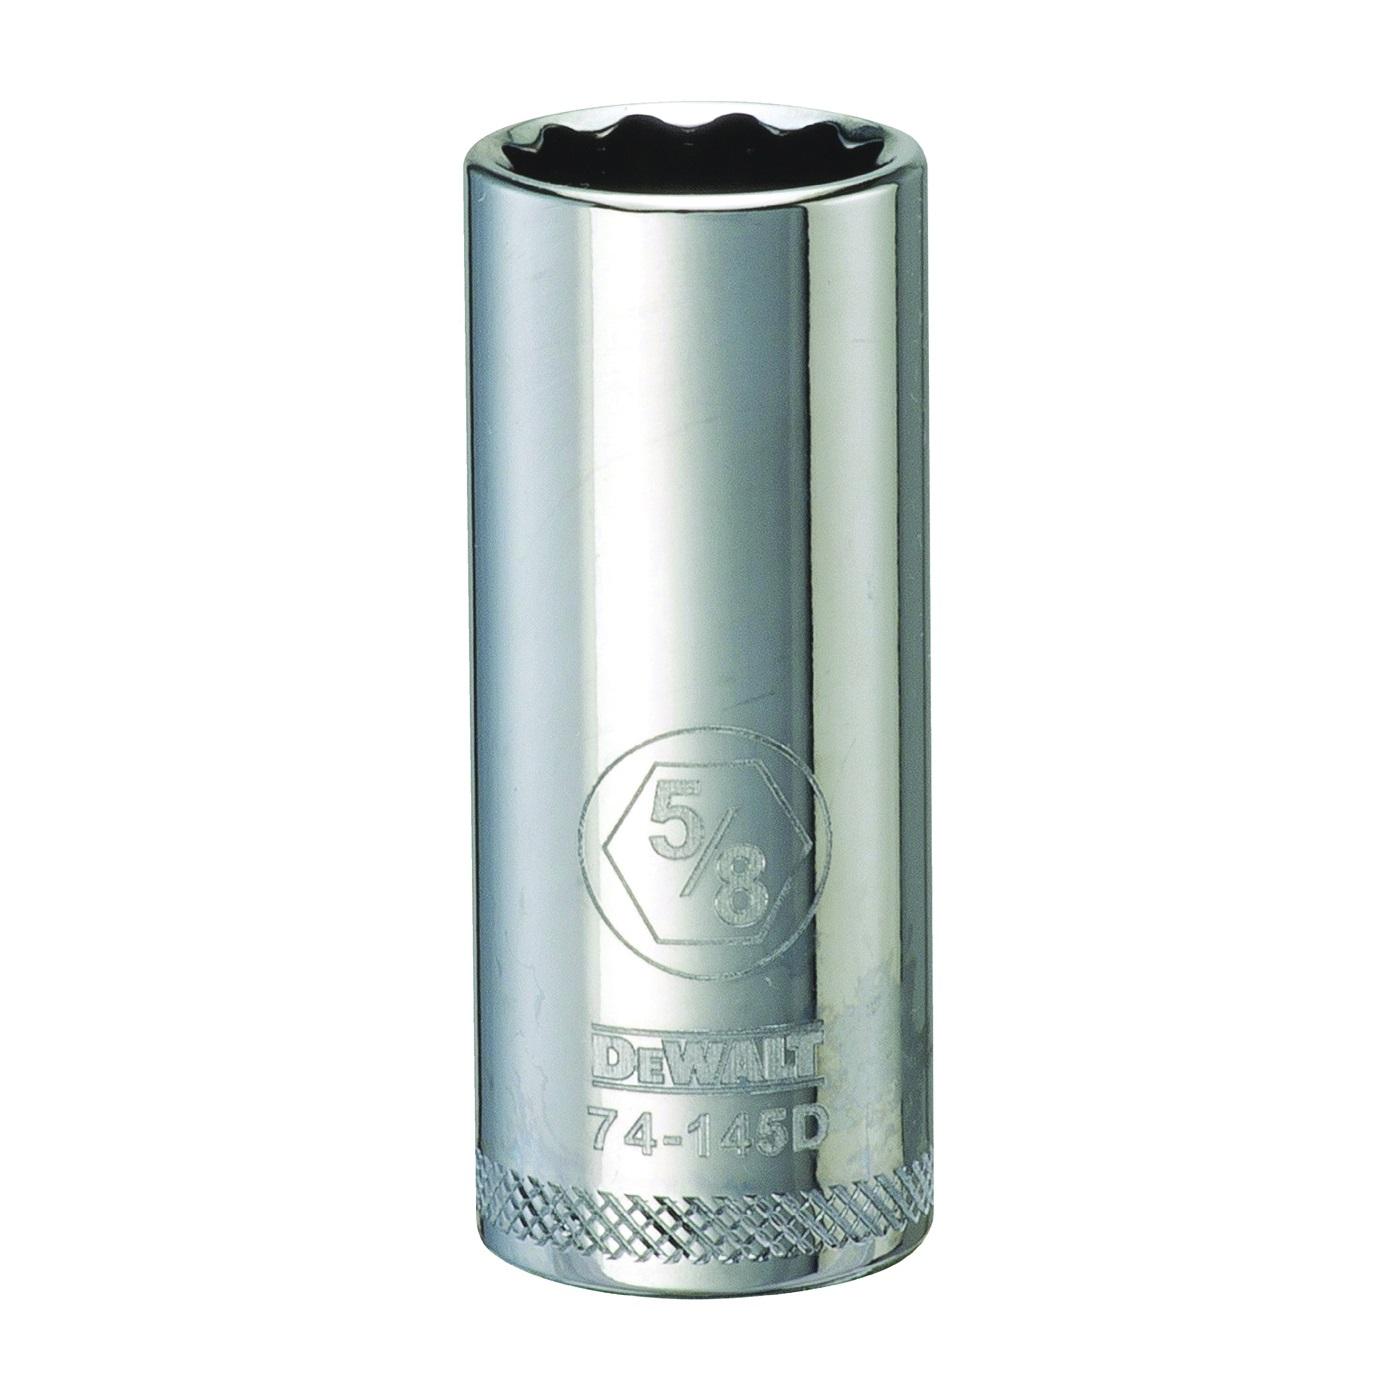 Picture of DeWALT DWMT74145OSP Drive Socket, 5/8 in Socket, 3/8 in Drive, 12 -Point, Vanadium Steel, Polished Chrome